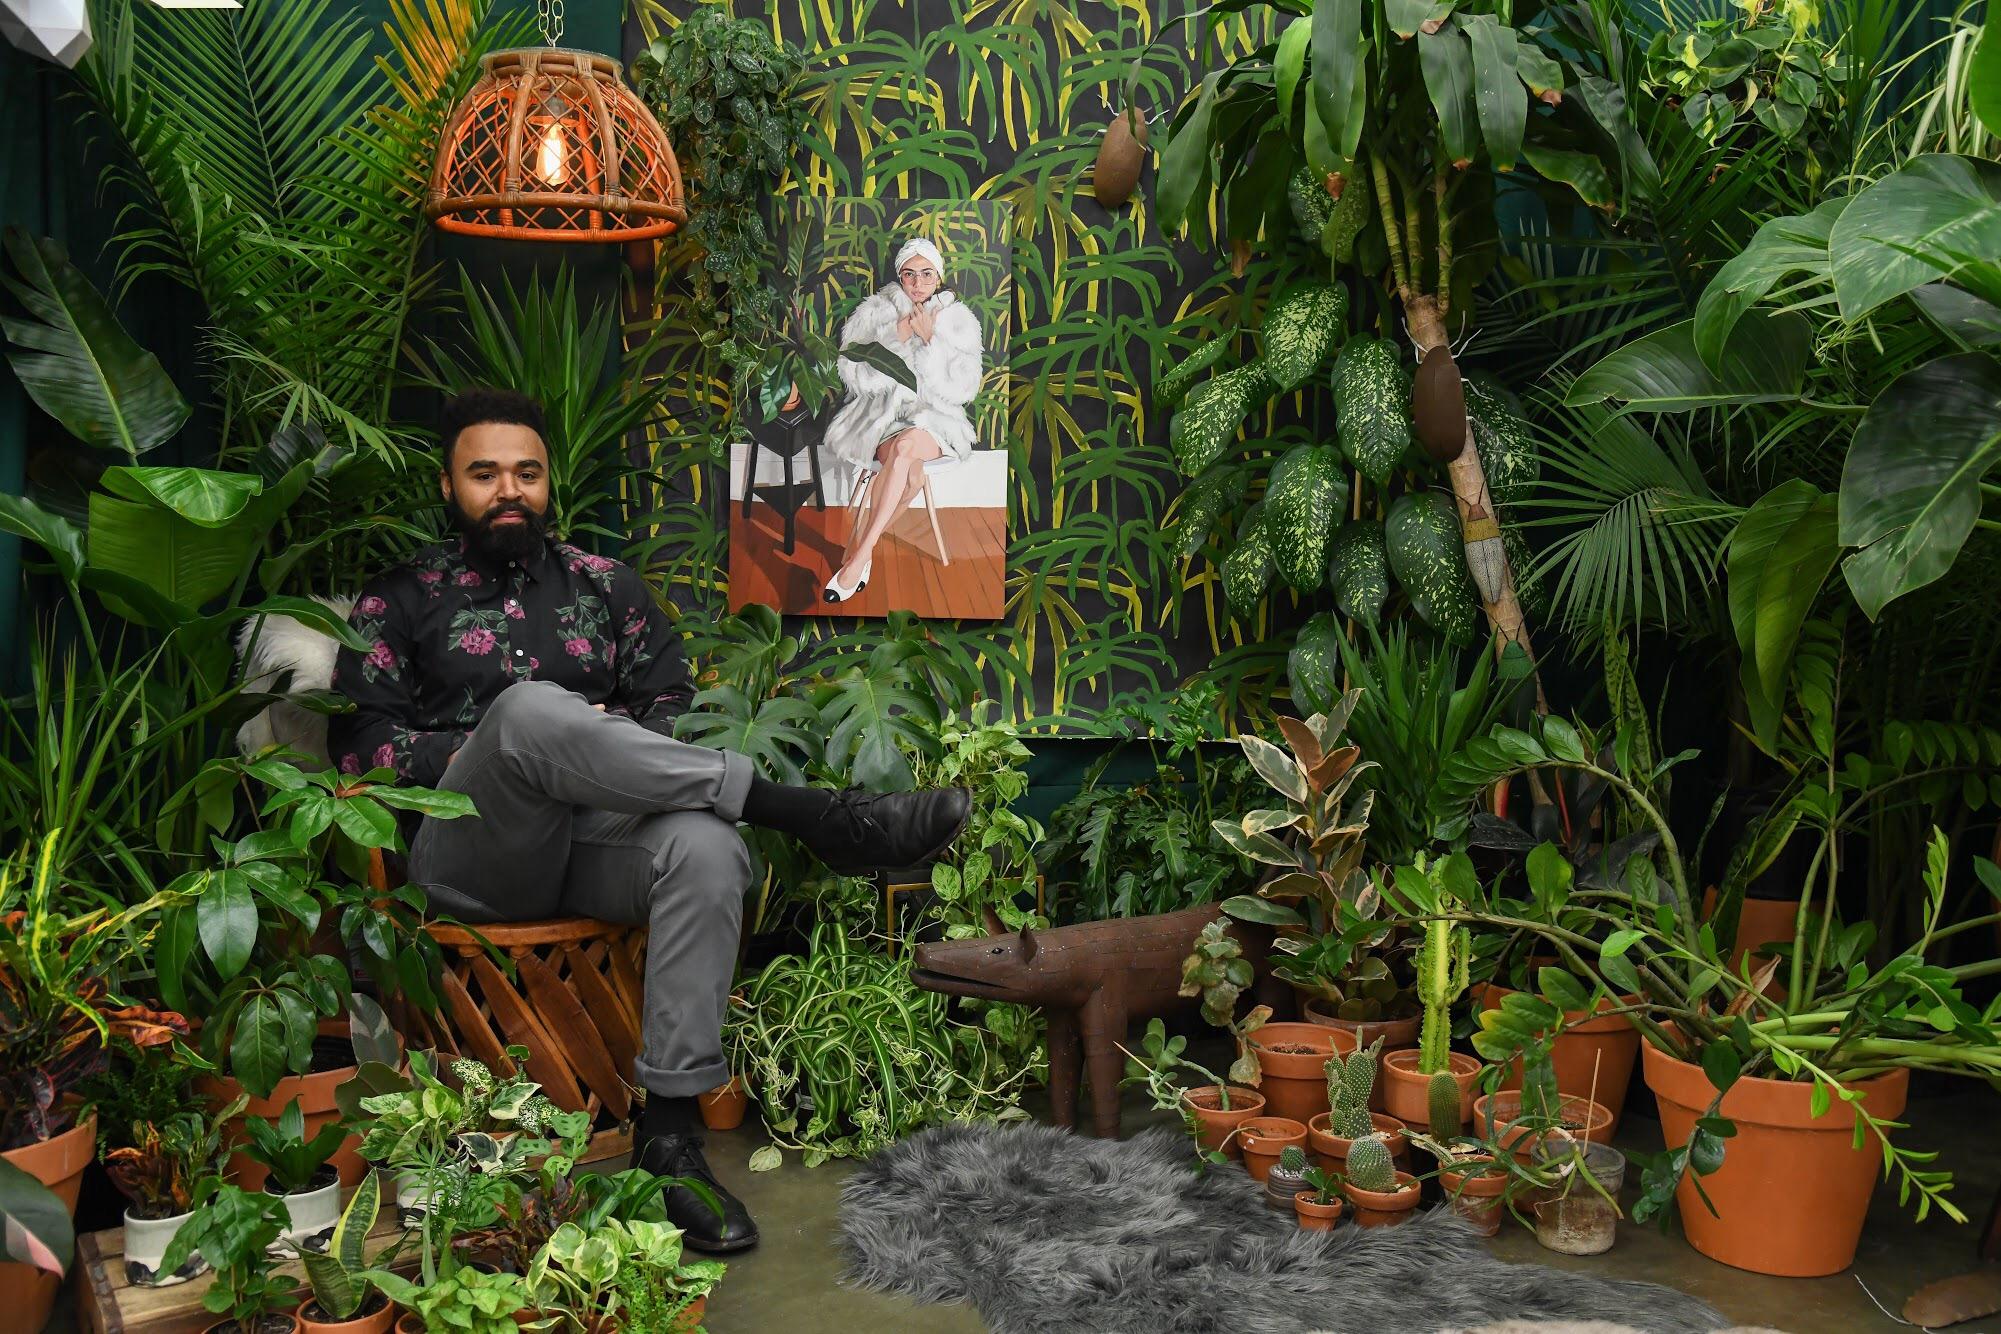 Designer  Hilton Carter  in his Make Room Indoor Jungle featuring artwork by  Erin Fitzpatrick ,  Paul Sumner , and  Elizabeth Benotti .